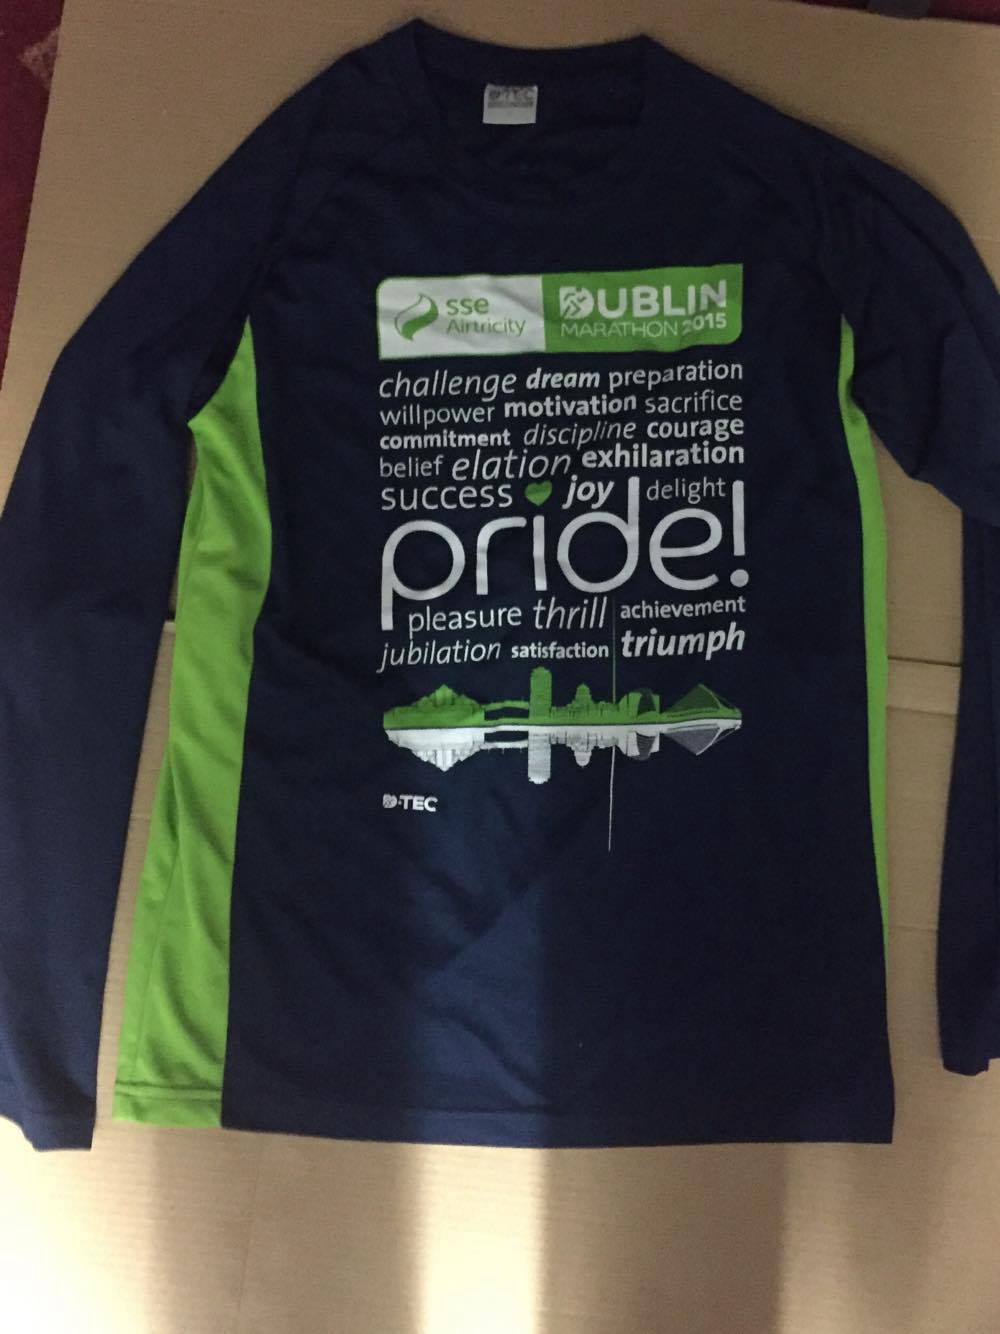 Design your own t shirt dublin - File Dublin Marathon 2015 Race T Shirt Png